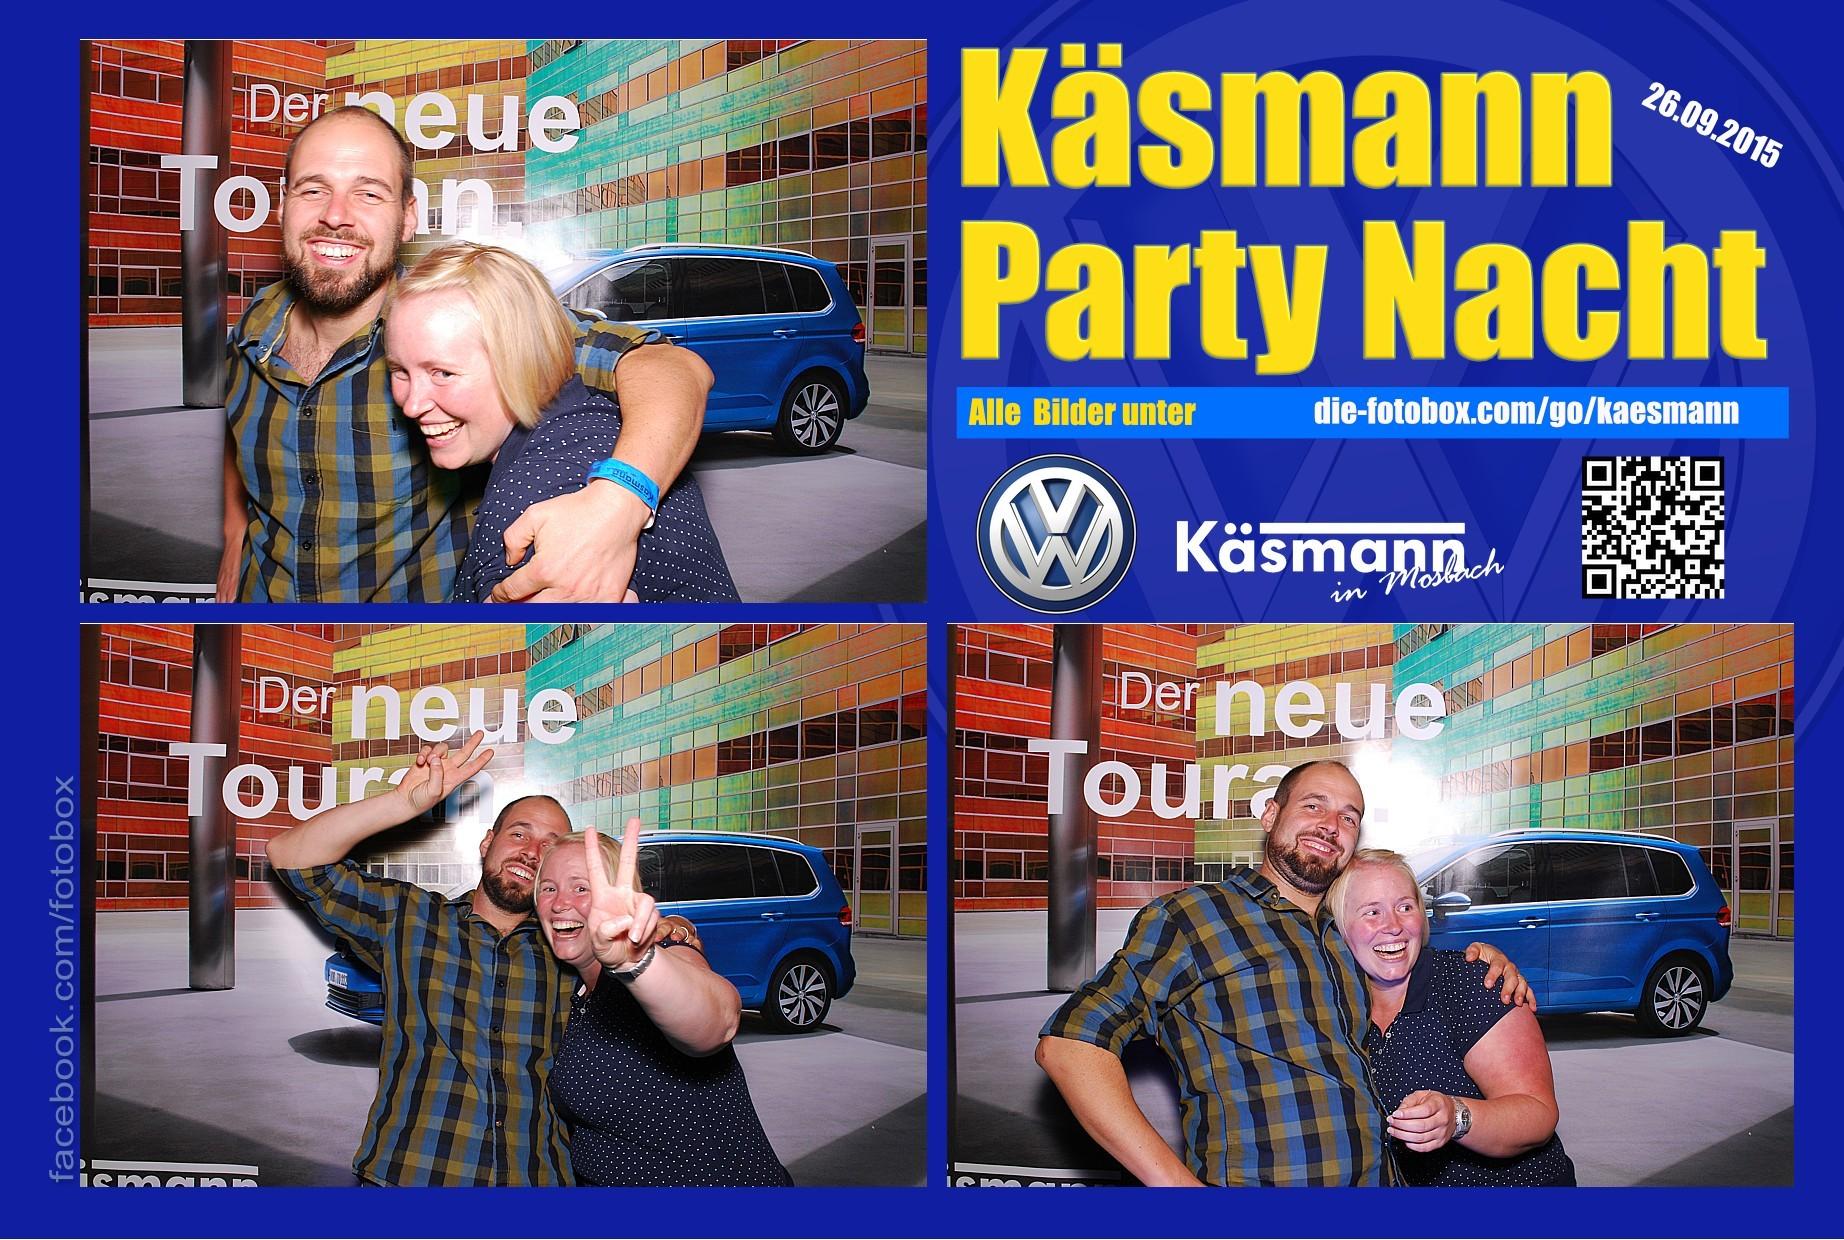 Käsmannparty 2015 - www.die-fotobox.com 01036